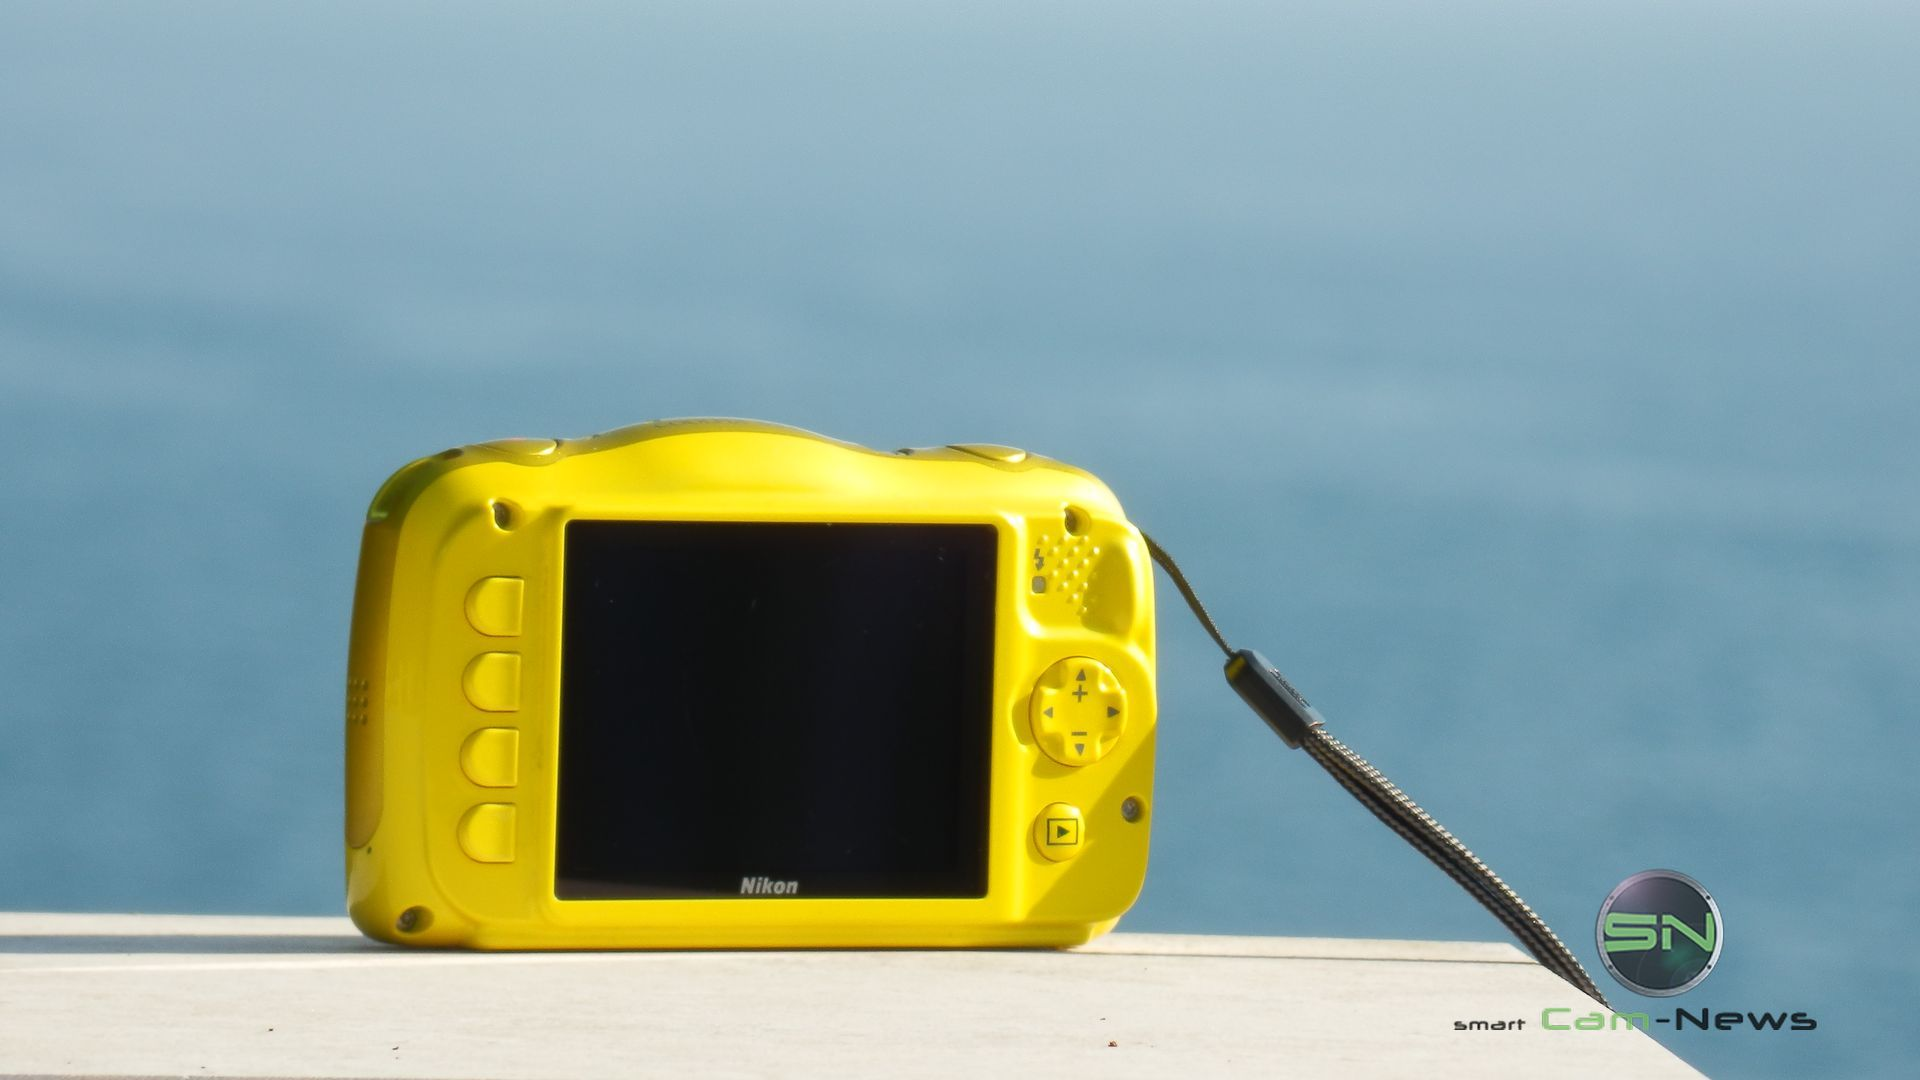 Rückseite Nikon Coolpix S33 Outdoor Kids Cam